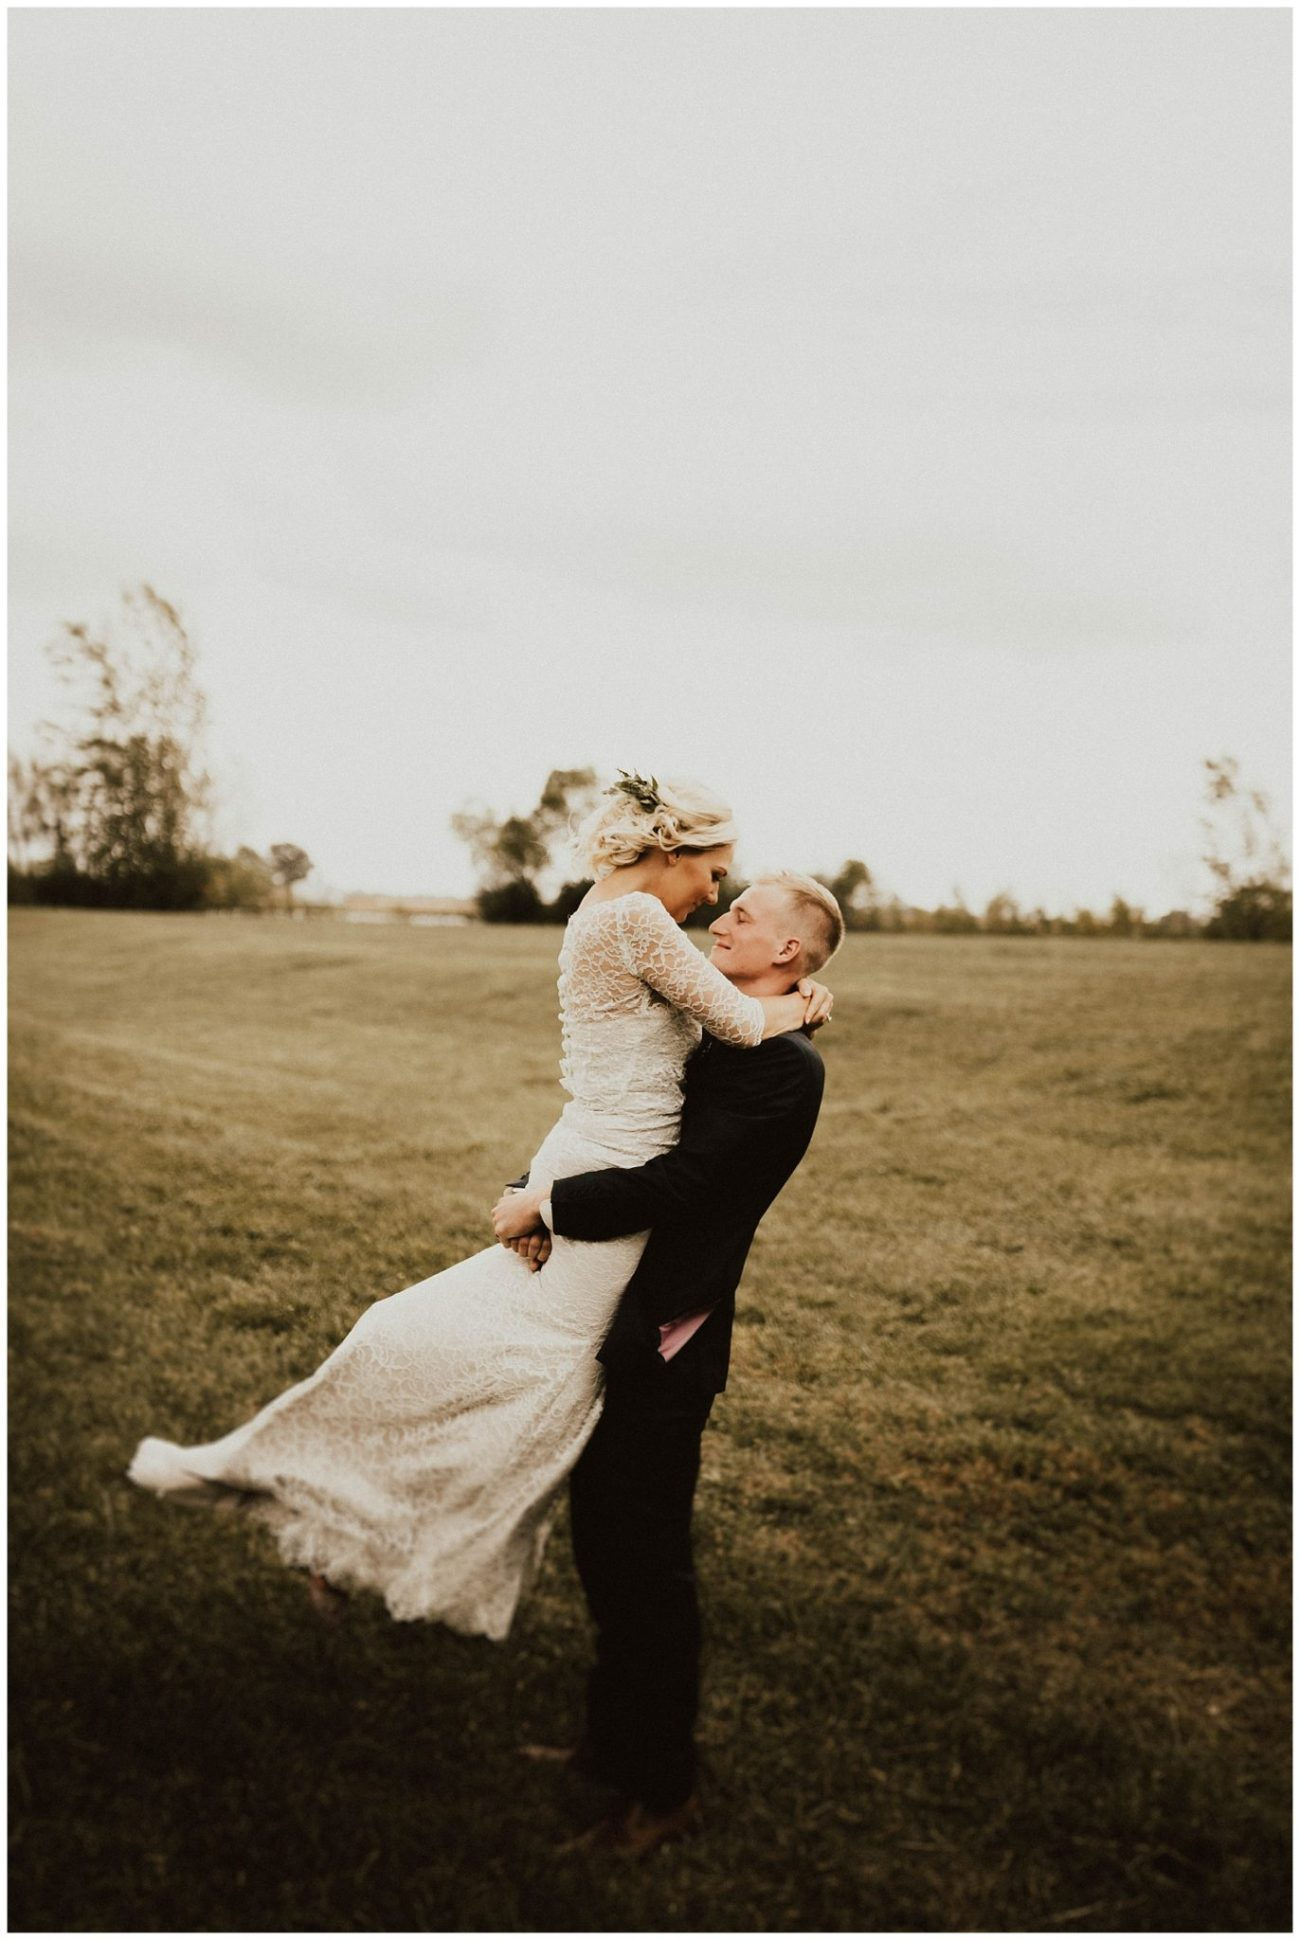 1511f3722b Intimate Backyard Wedding - Lauren F.otography | Central Illinois ...